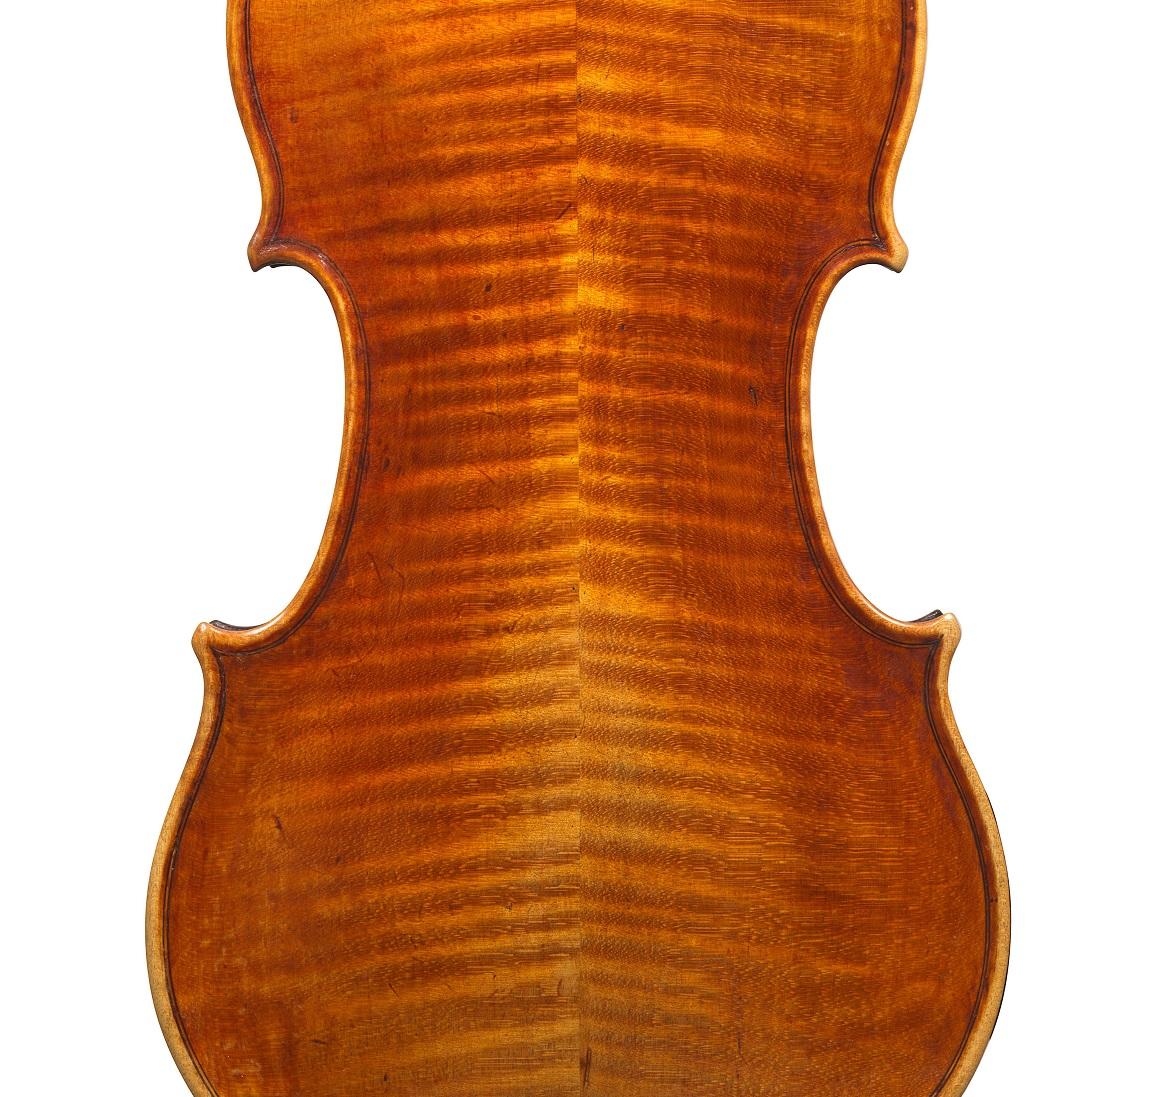 Back of a violin by Matteo Goffriller, circa 1700